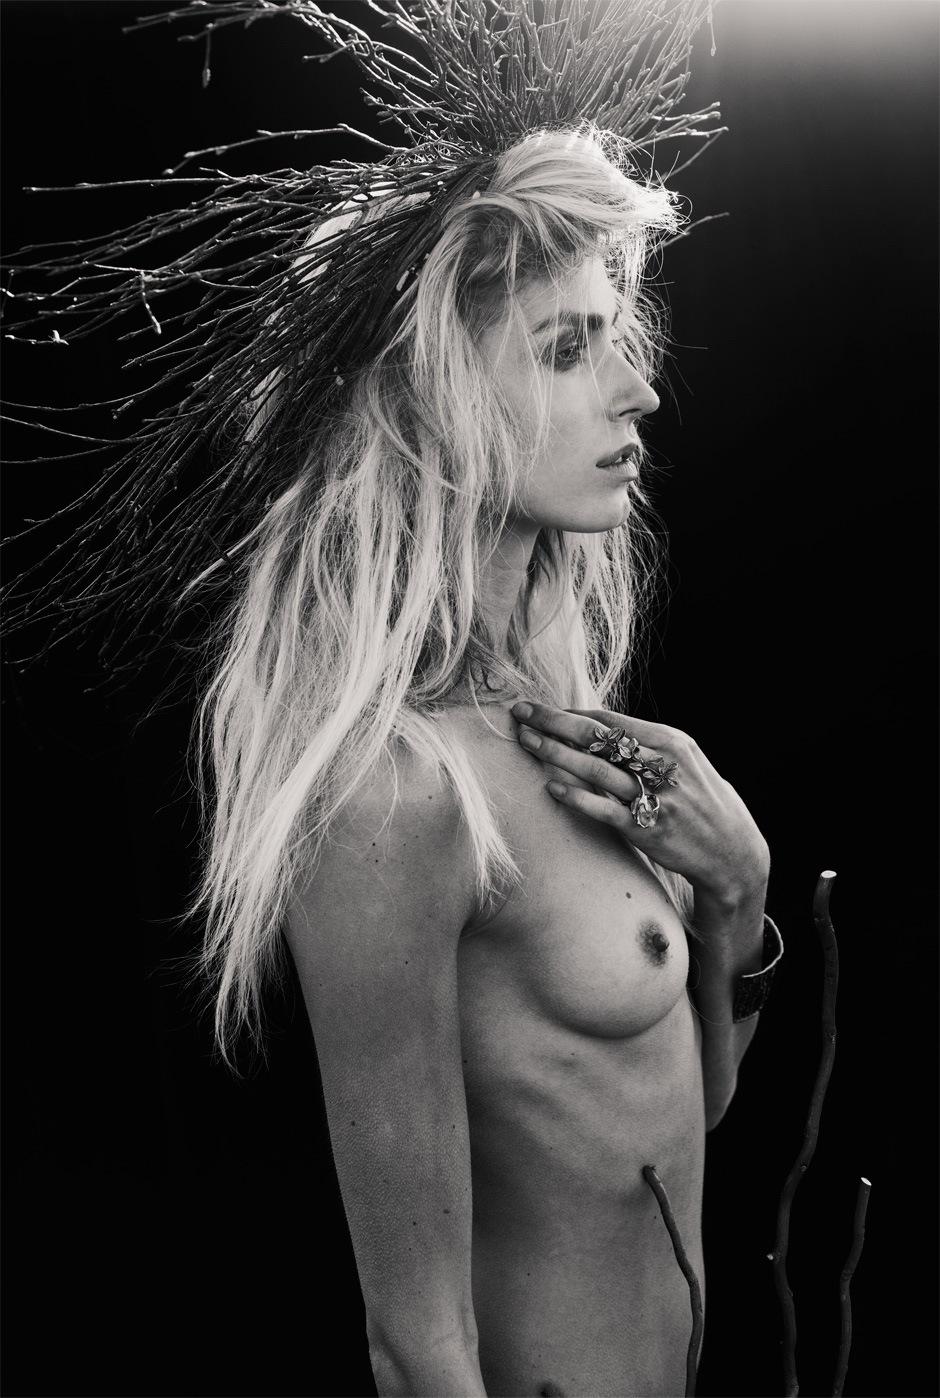 Milena-Aaron_Feaver-Confashion_Magazine-04-fashionising.jpeg